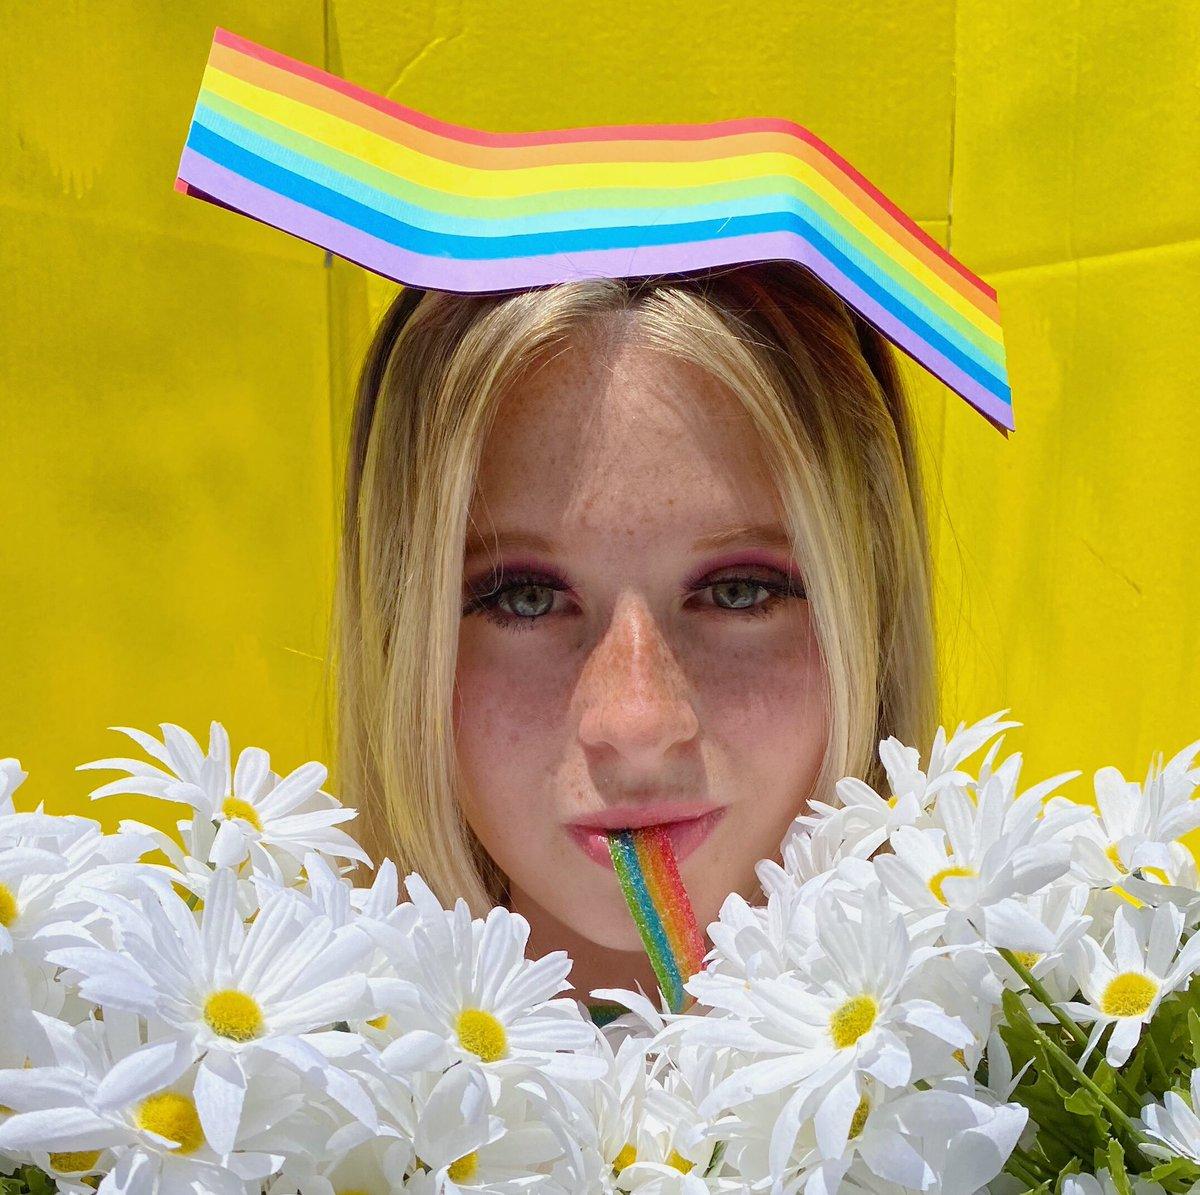 #CANTCANCELPRIDE @katyperry 🏳️🌈 #daisies https://t.co/JxbetcOsx2